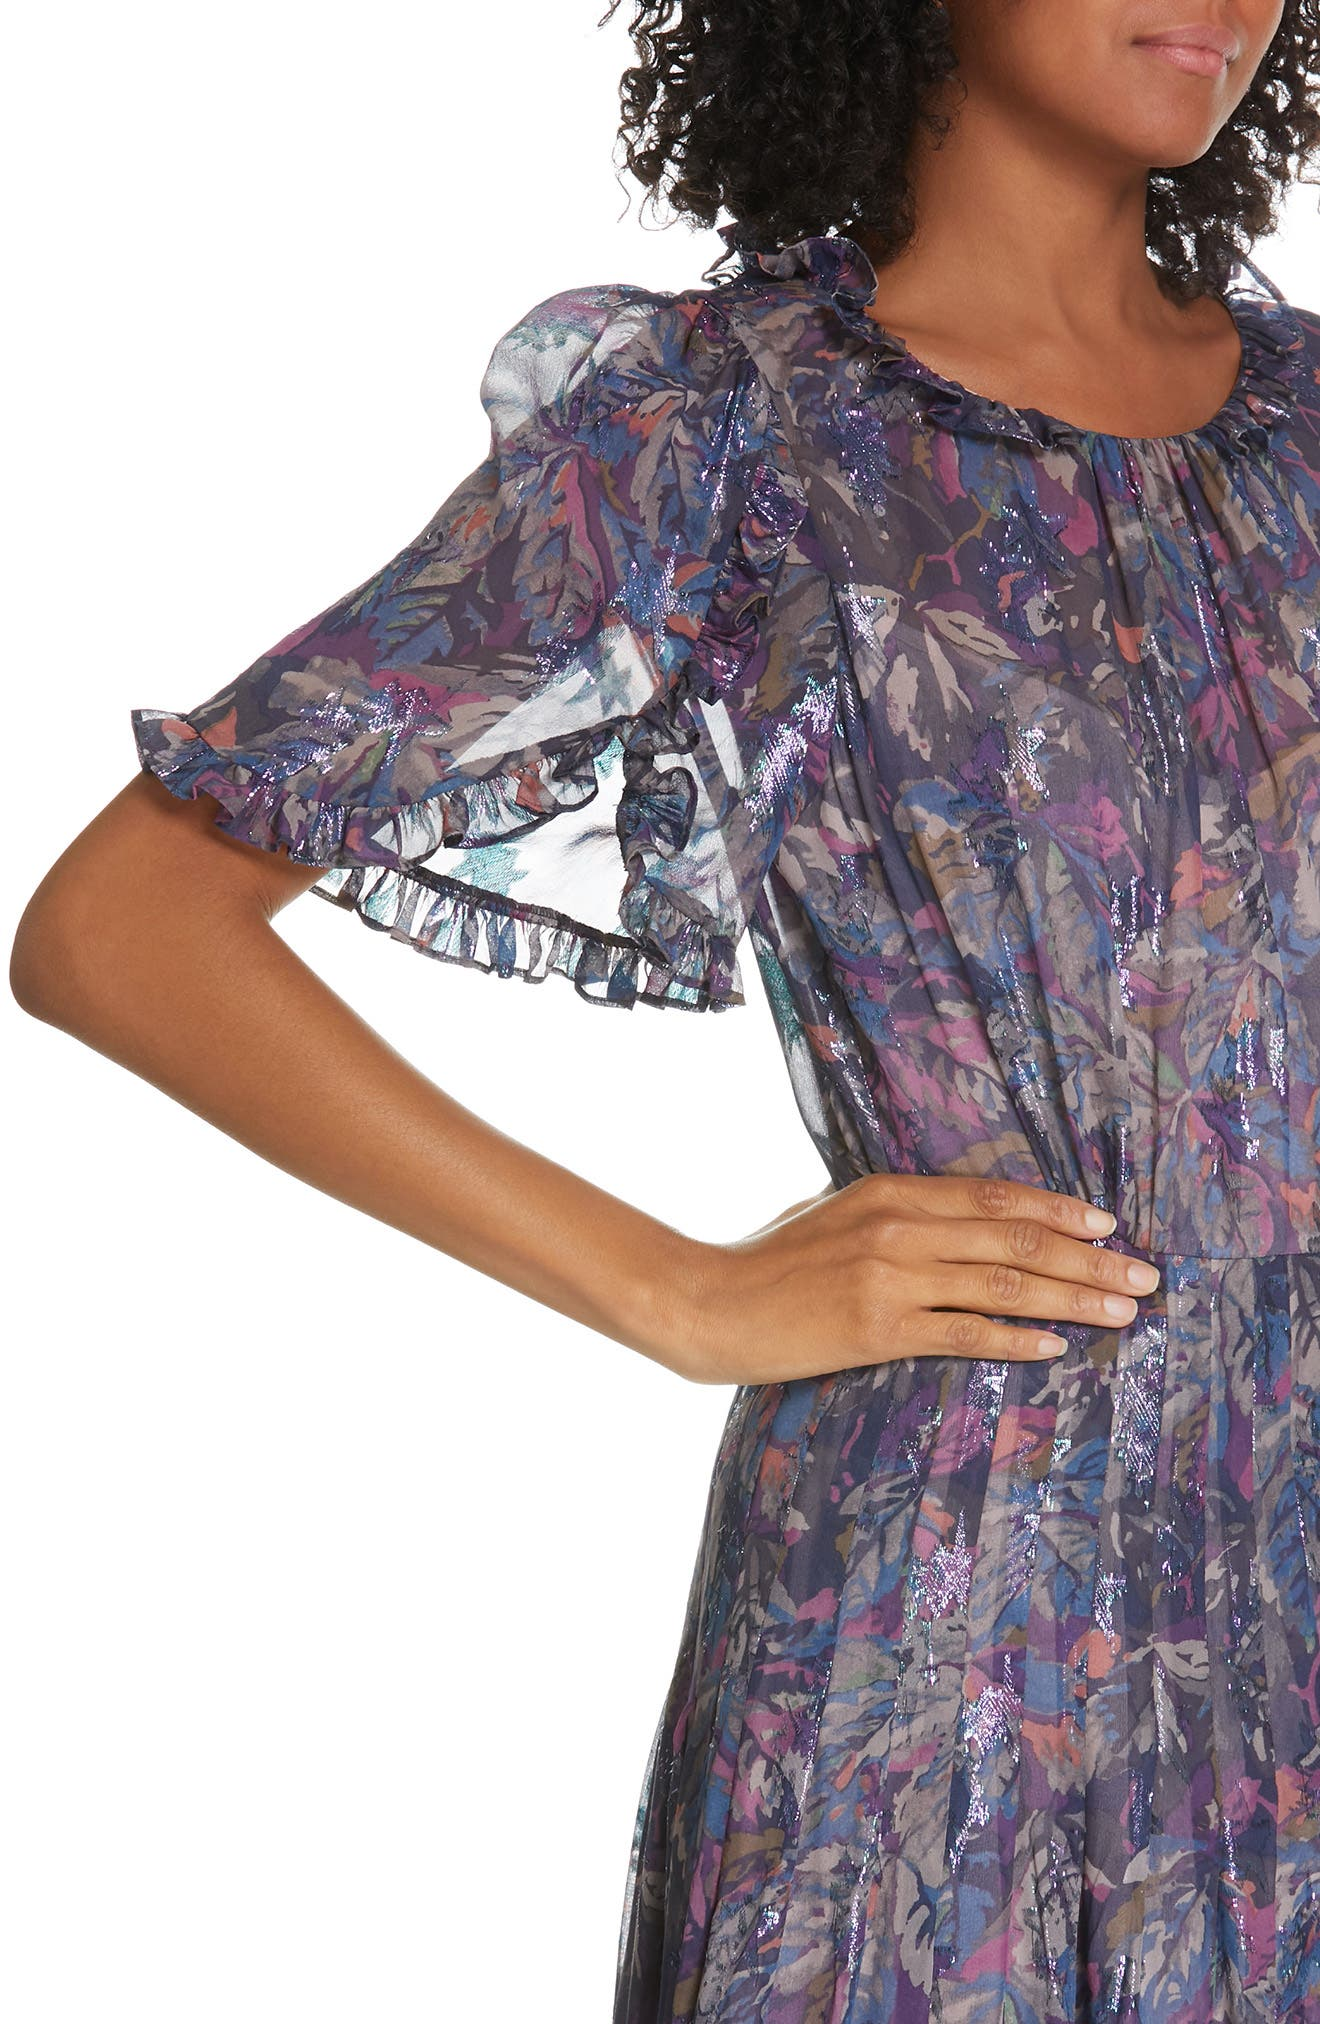 Giverny Metallic Detail Silk Chiffon Dress,                             Alternate thumbnail 4, color,                             AMETHYST COMBO